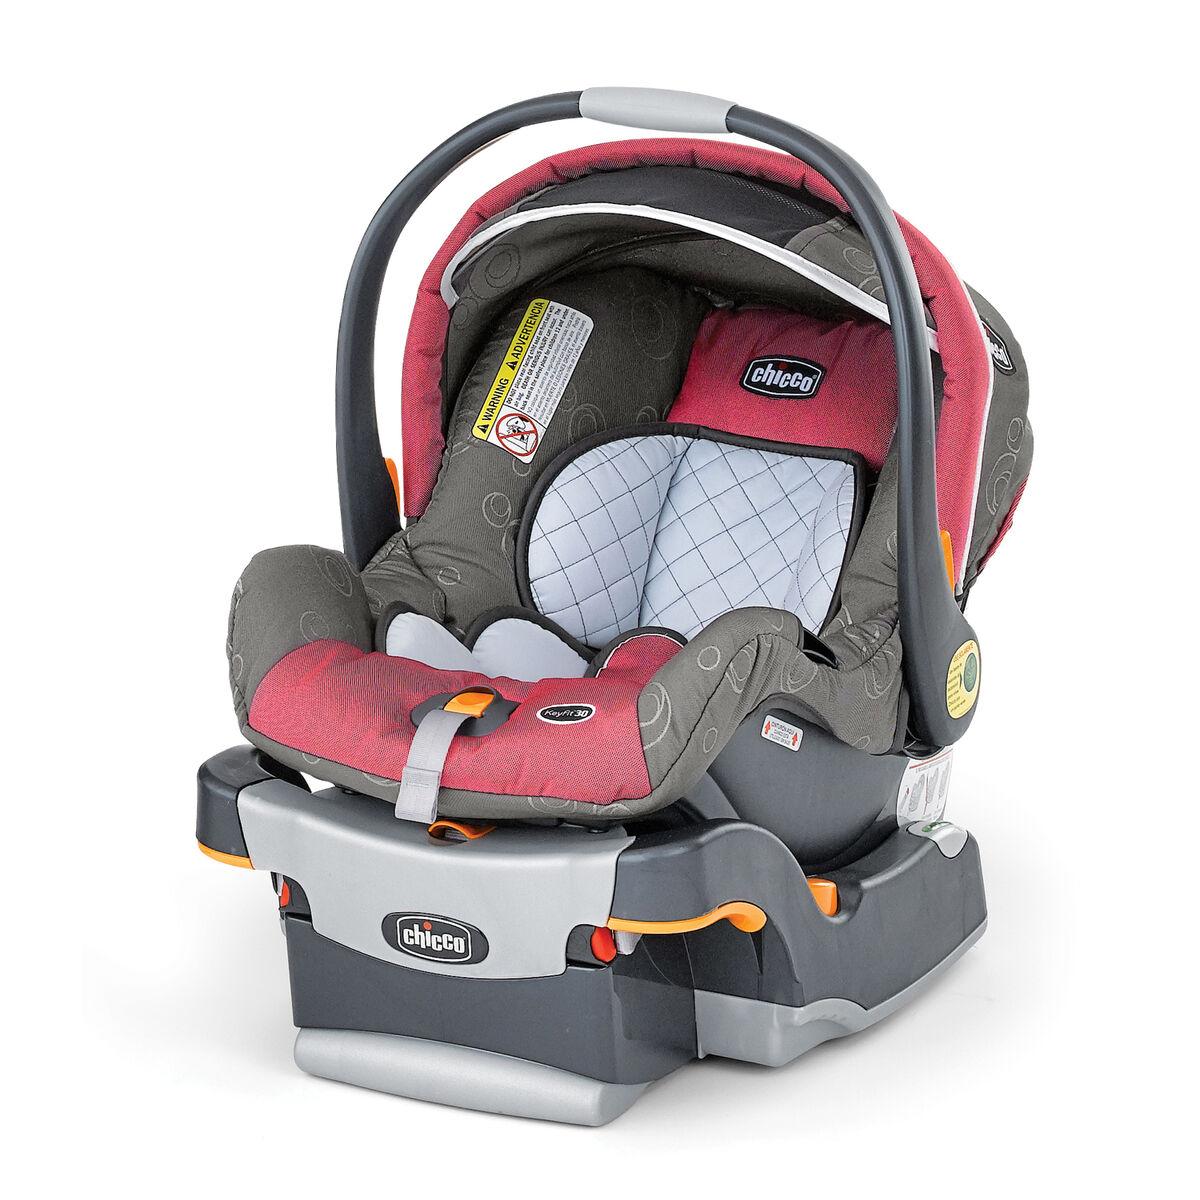 Keyfit 30 infant car seat base foxykeyfit 30 infant car seat base foxy